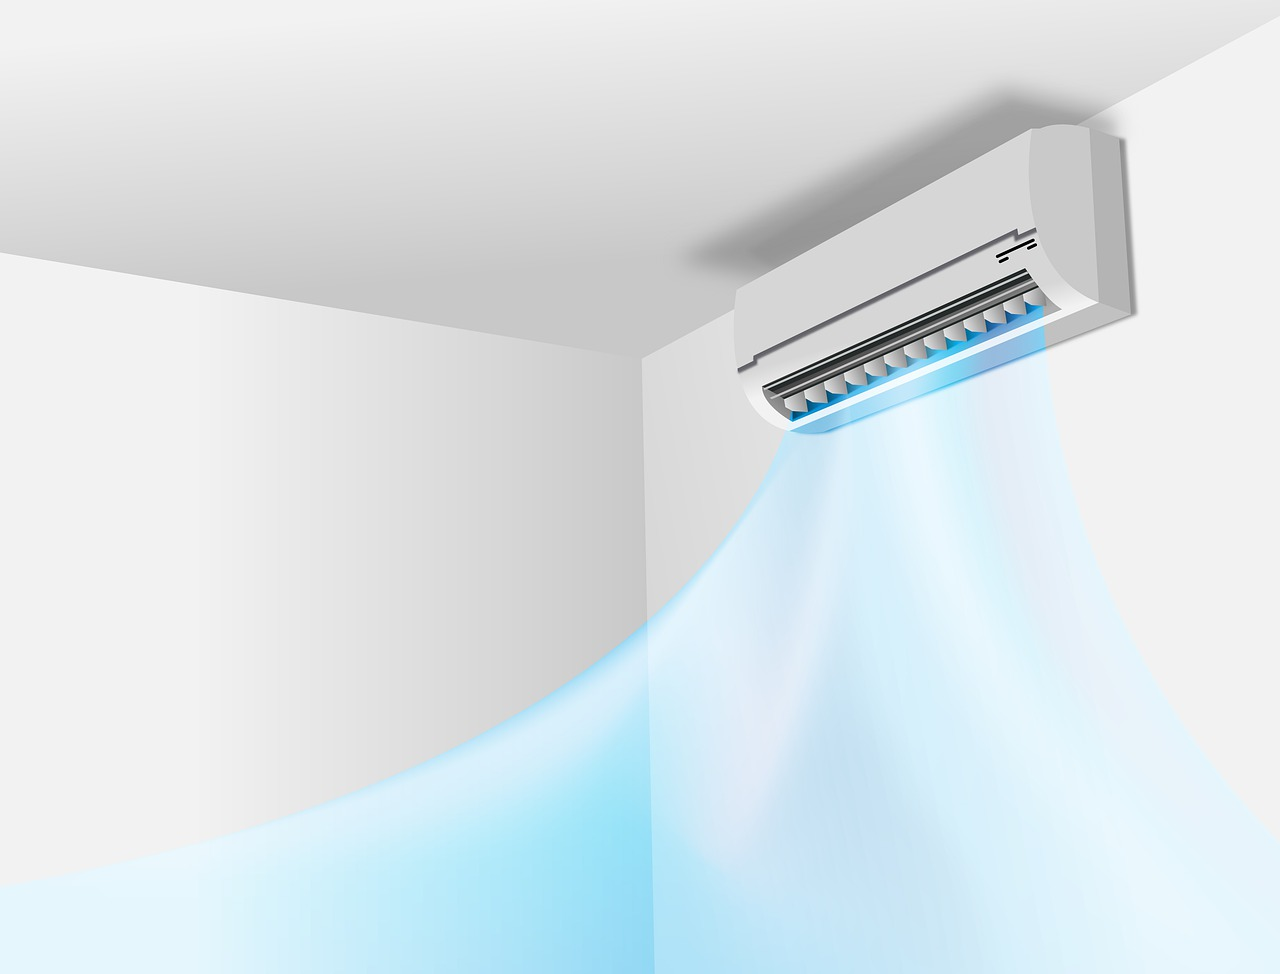 installation et entretien de climatisation